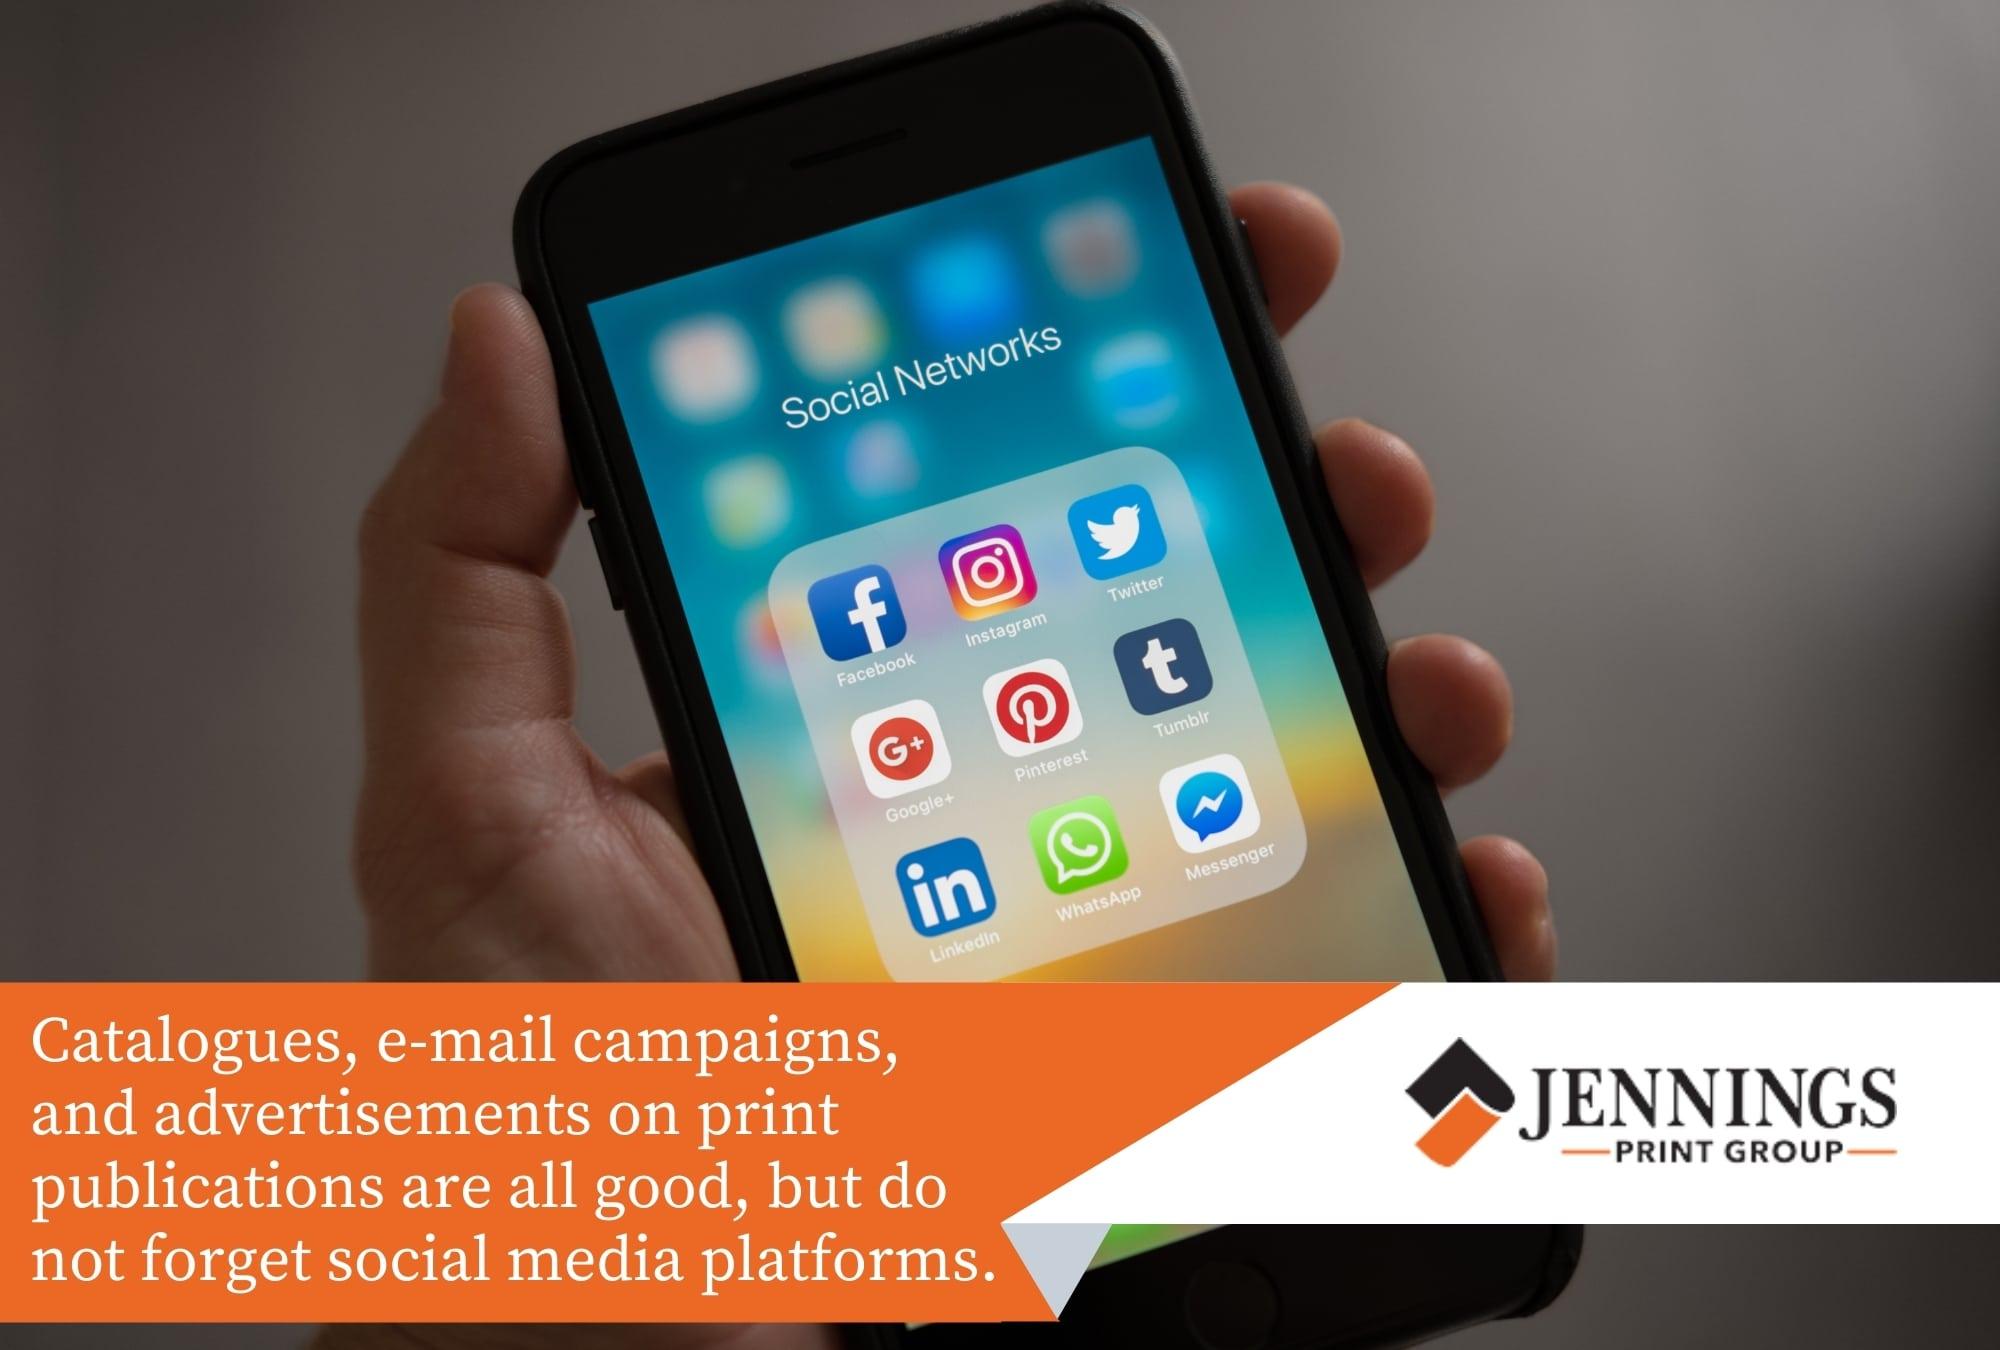 Utilise social media platforms.